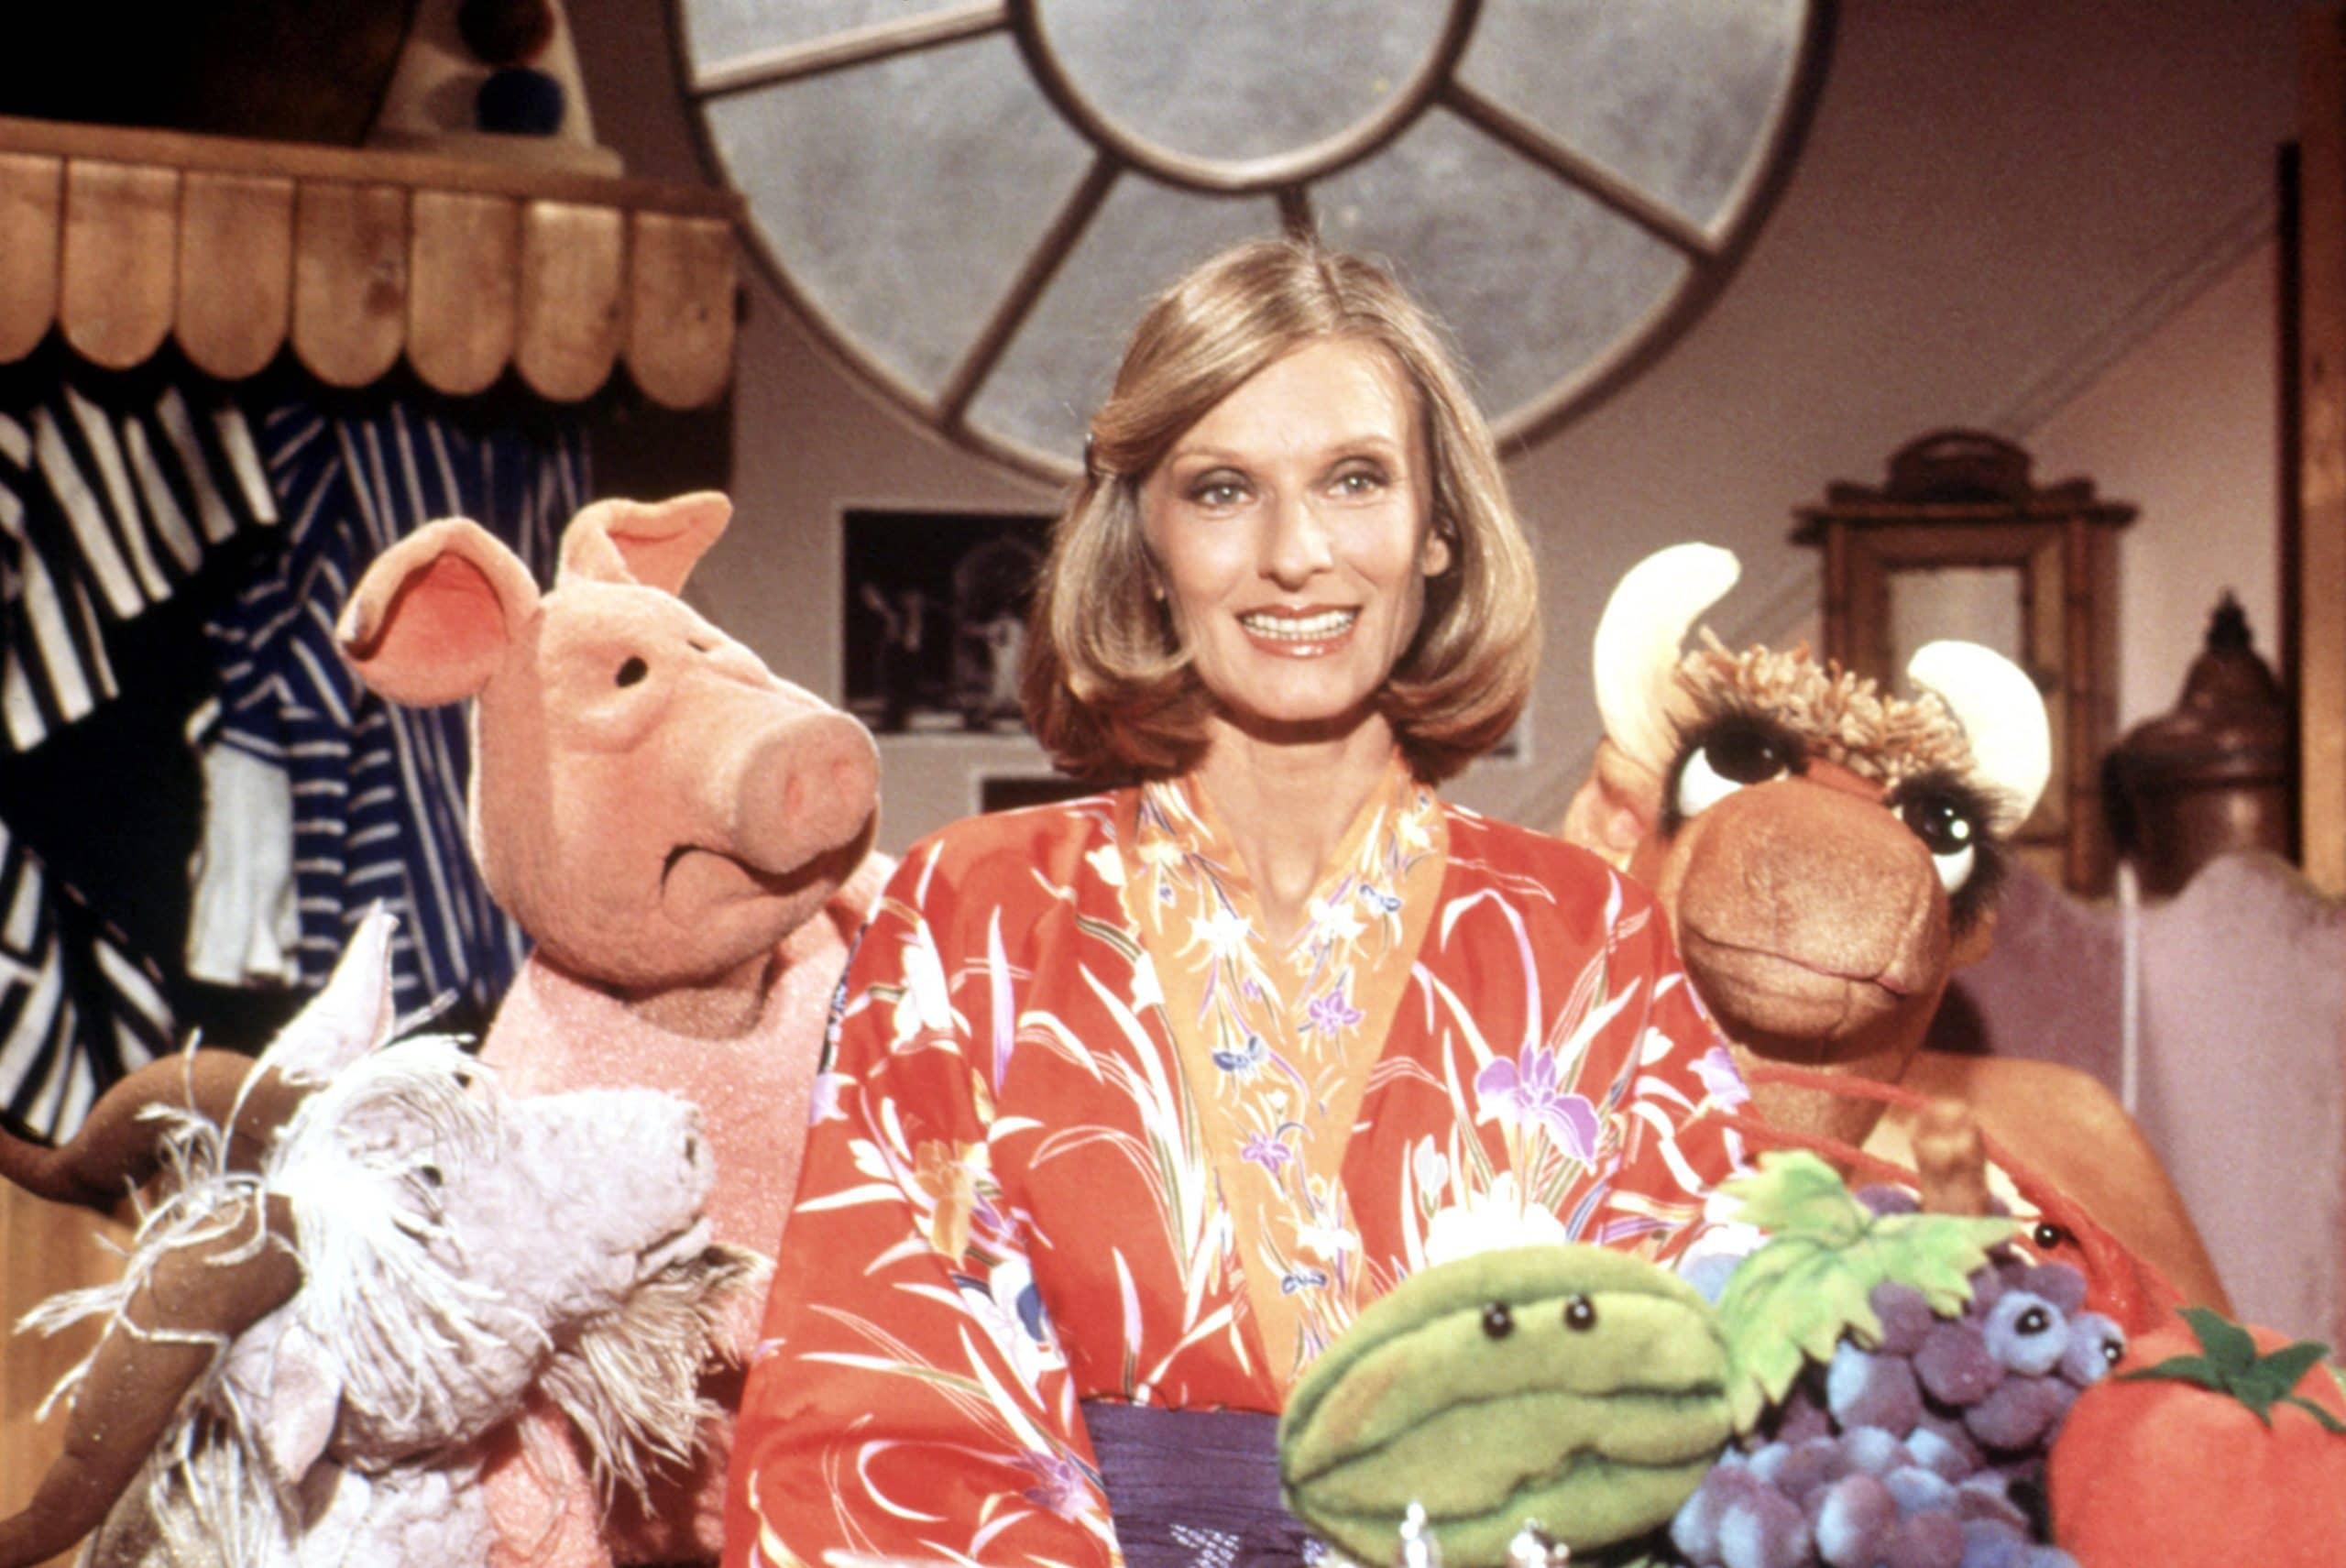 THE MUPPET SHOW, Cloris Leachman